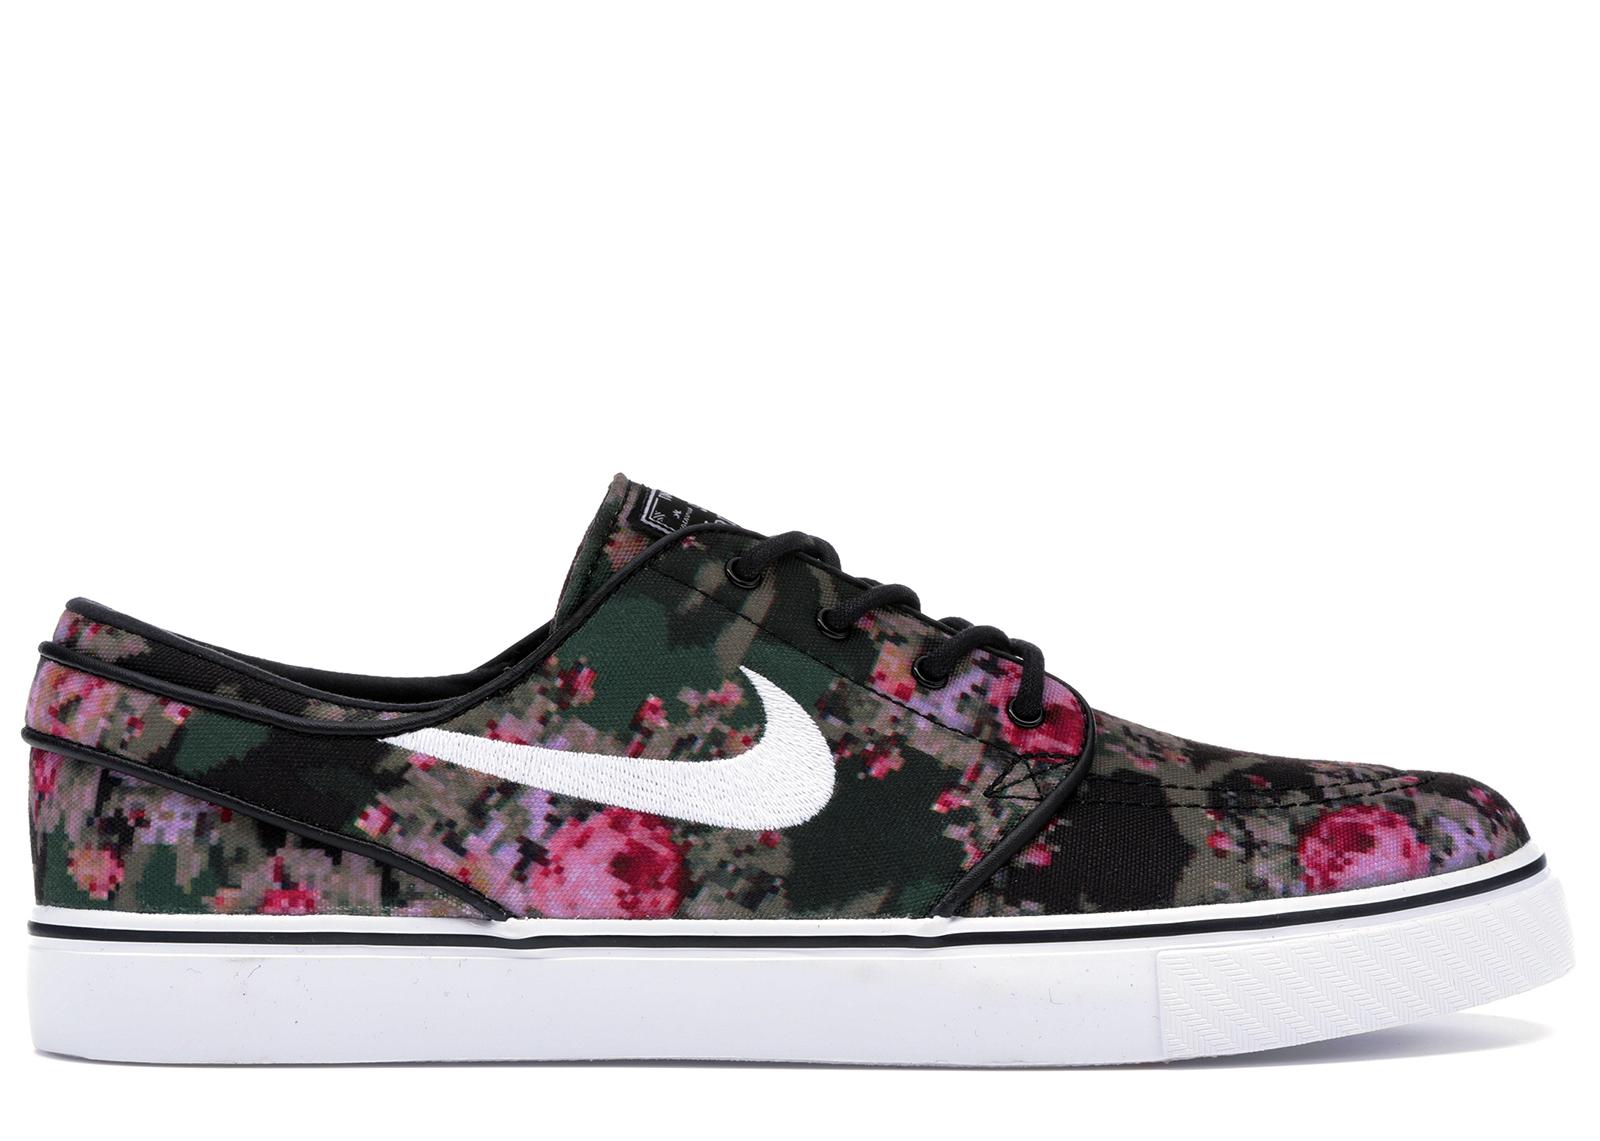 Nike SB Stefan Janoski Zoom Digi Floral Pink (2016) - 482972-900